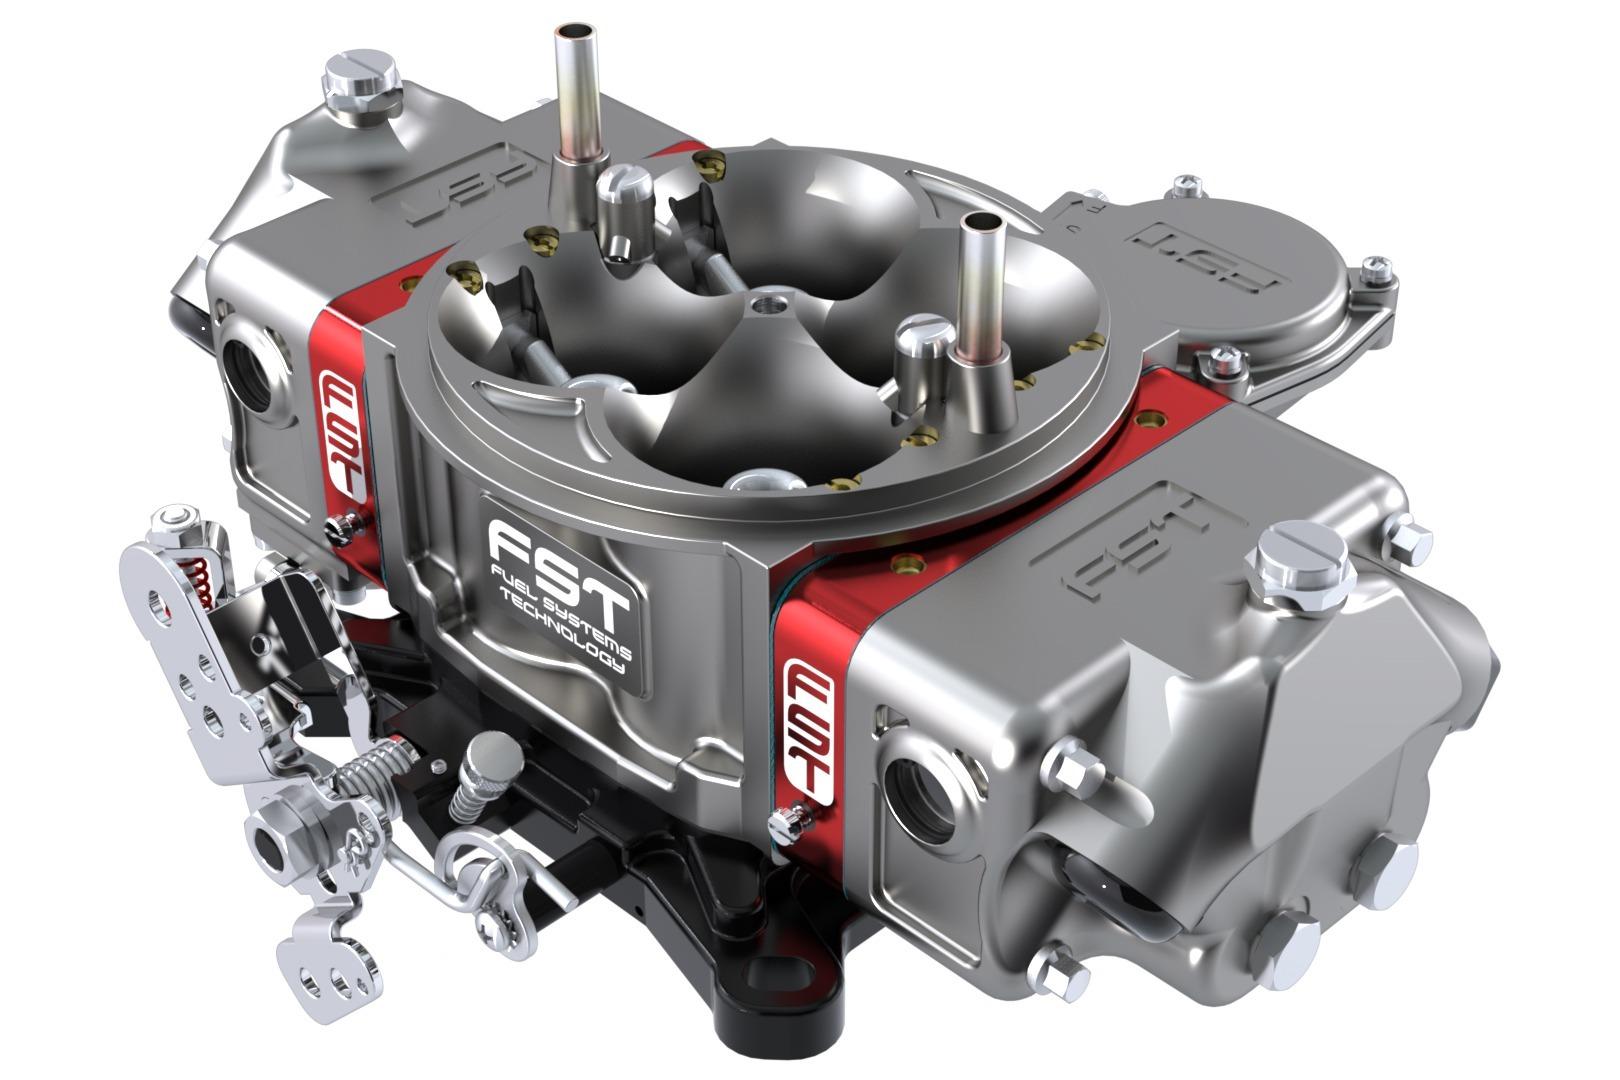 FST Performance Carburetor 41650B Carburetor, Billet X-treme, 4-Barrel, 650 CFM, Square Bore, Vacuum Secondary, Dual Inlet, Titanium Anodized, Each